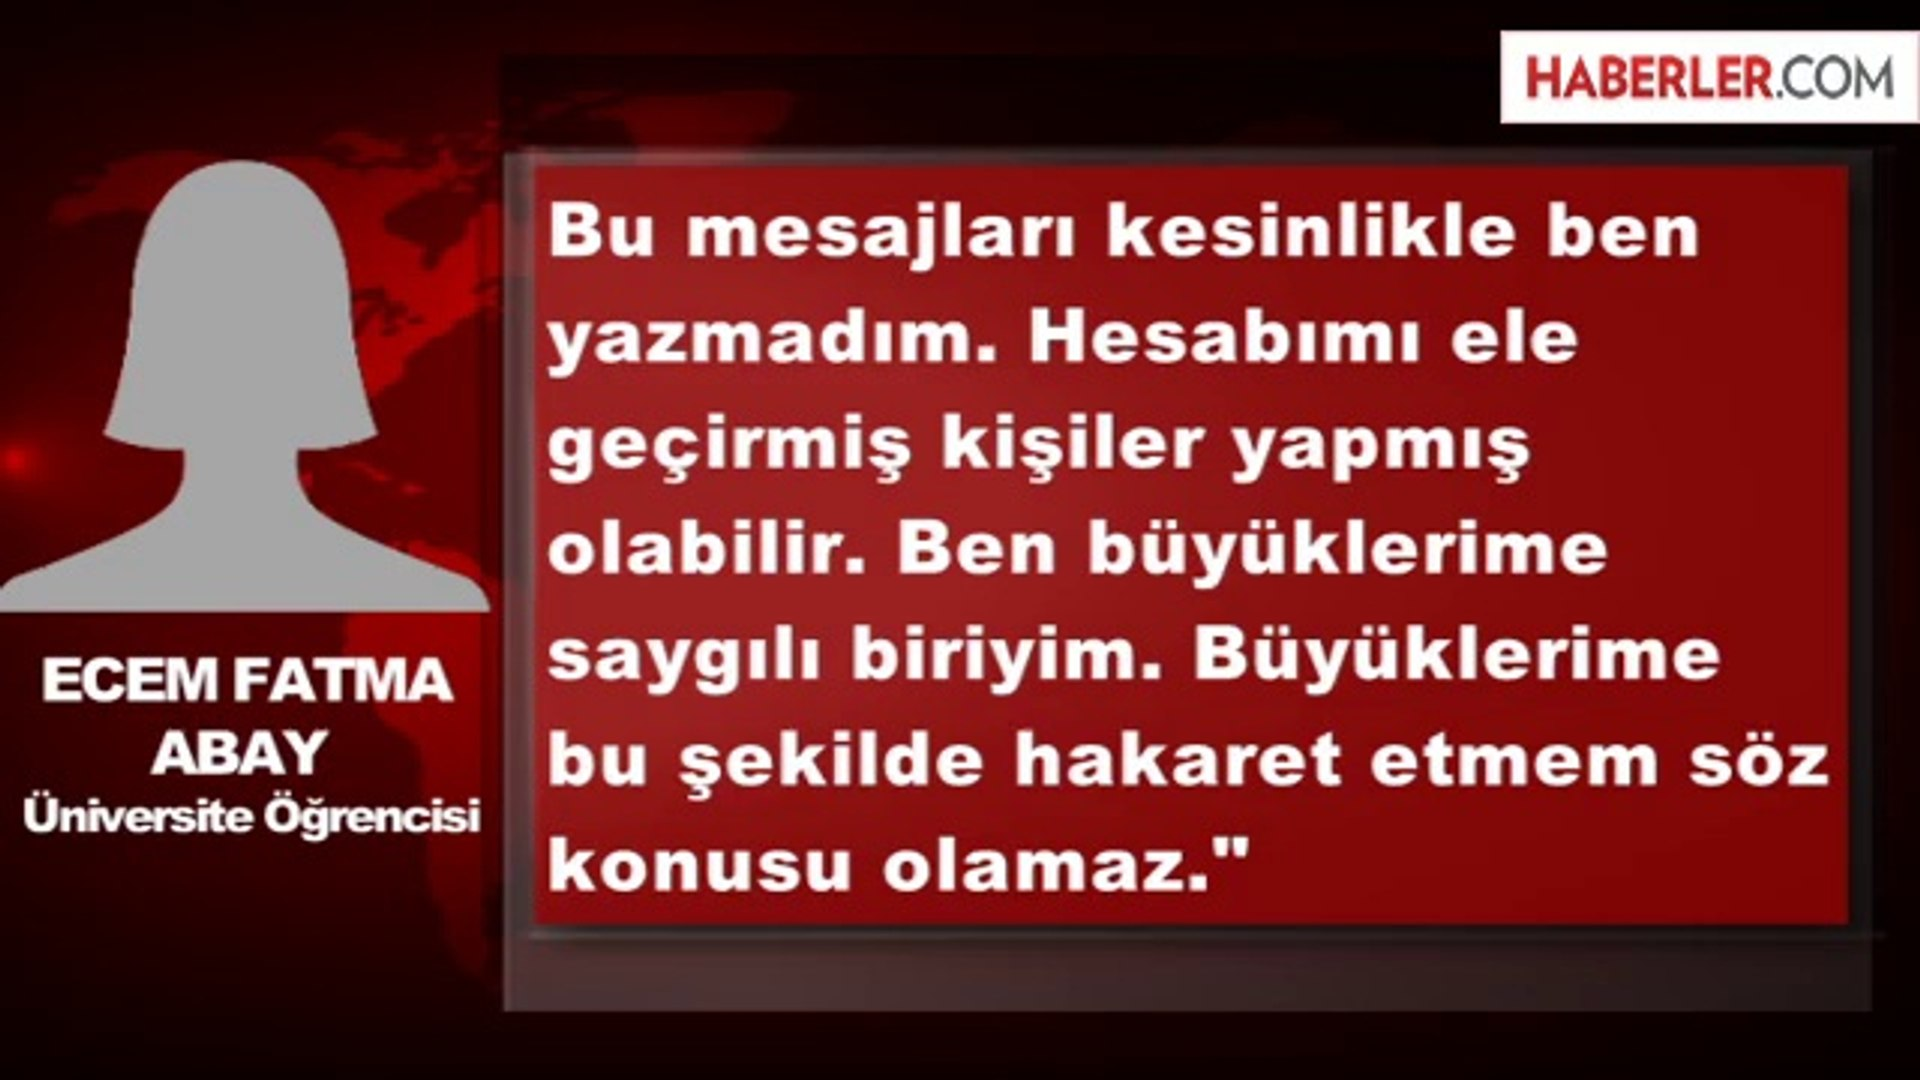 Başbakan Erdoğan'a Facebook'tan Hakaret Edene 6080 TL Ceza